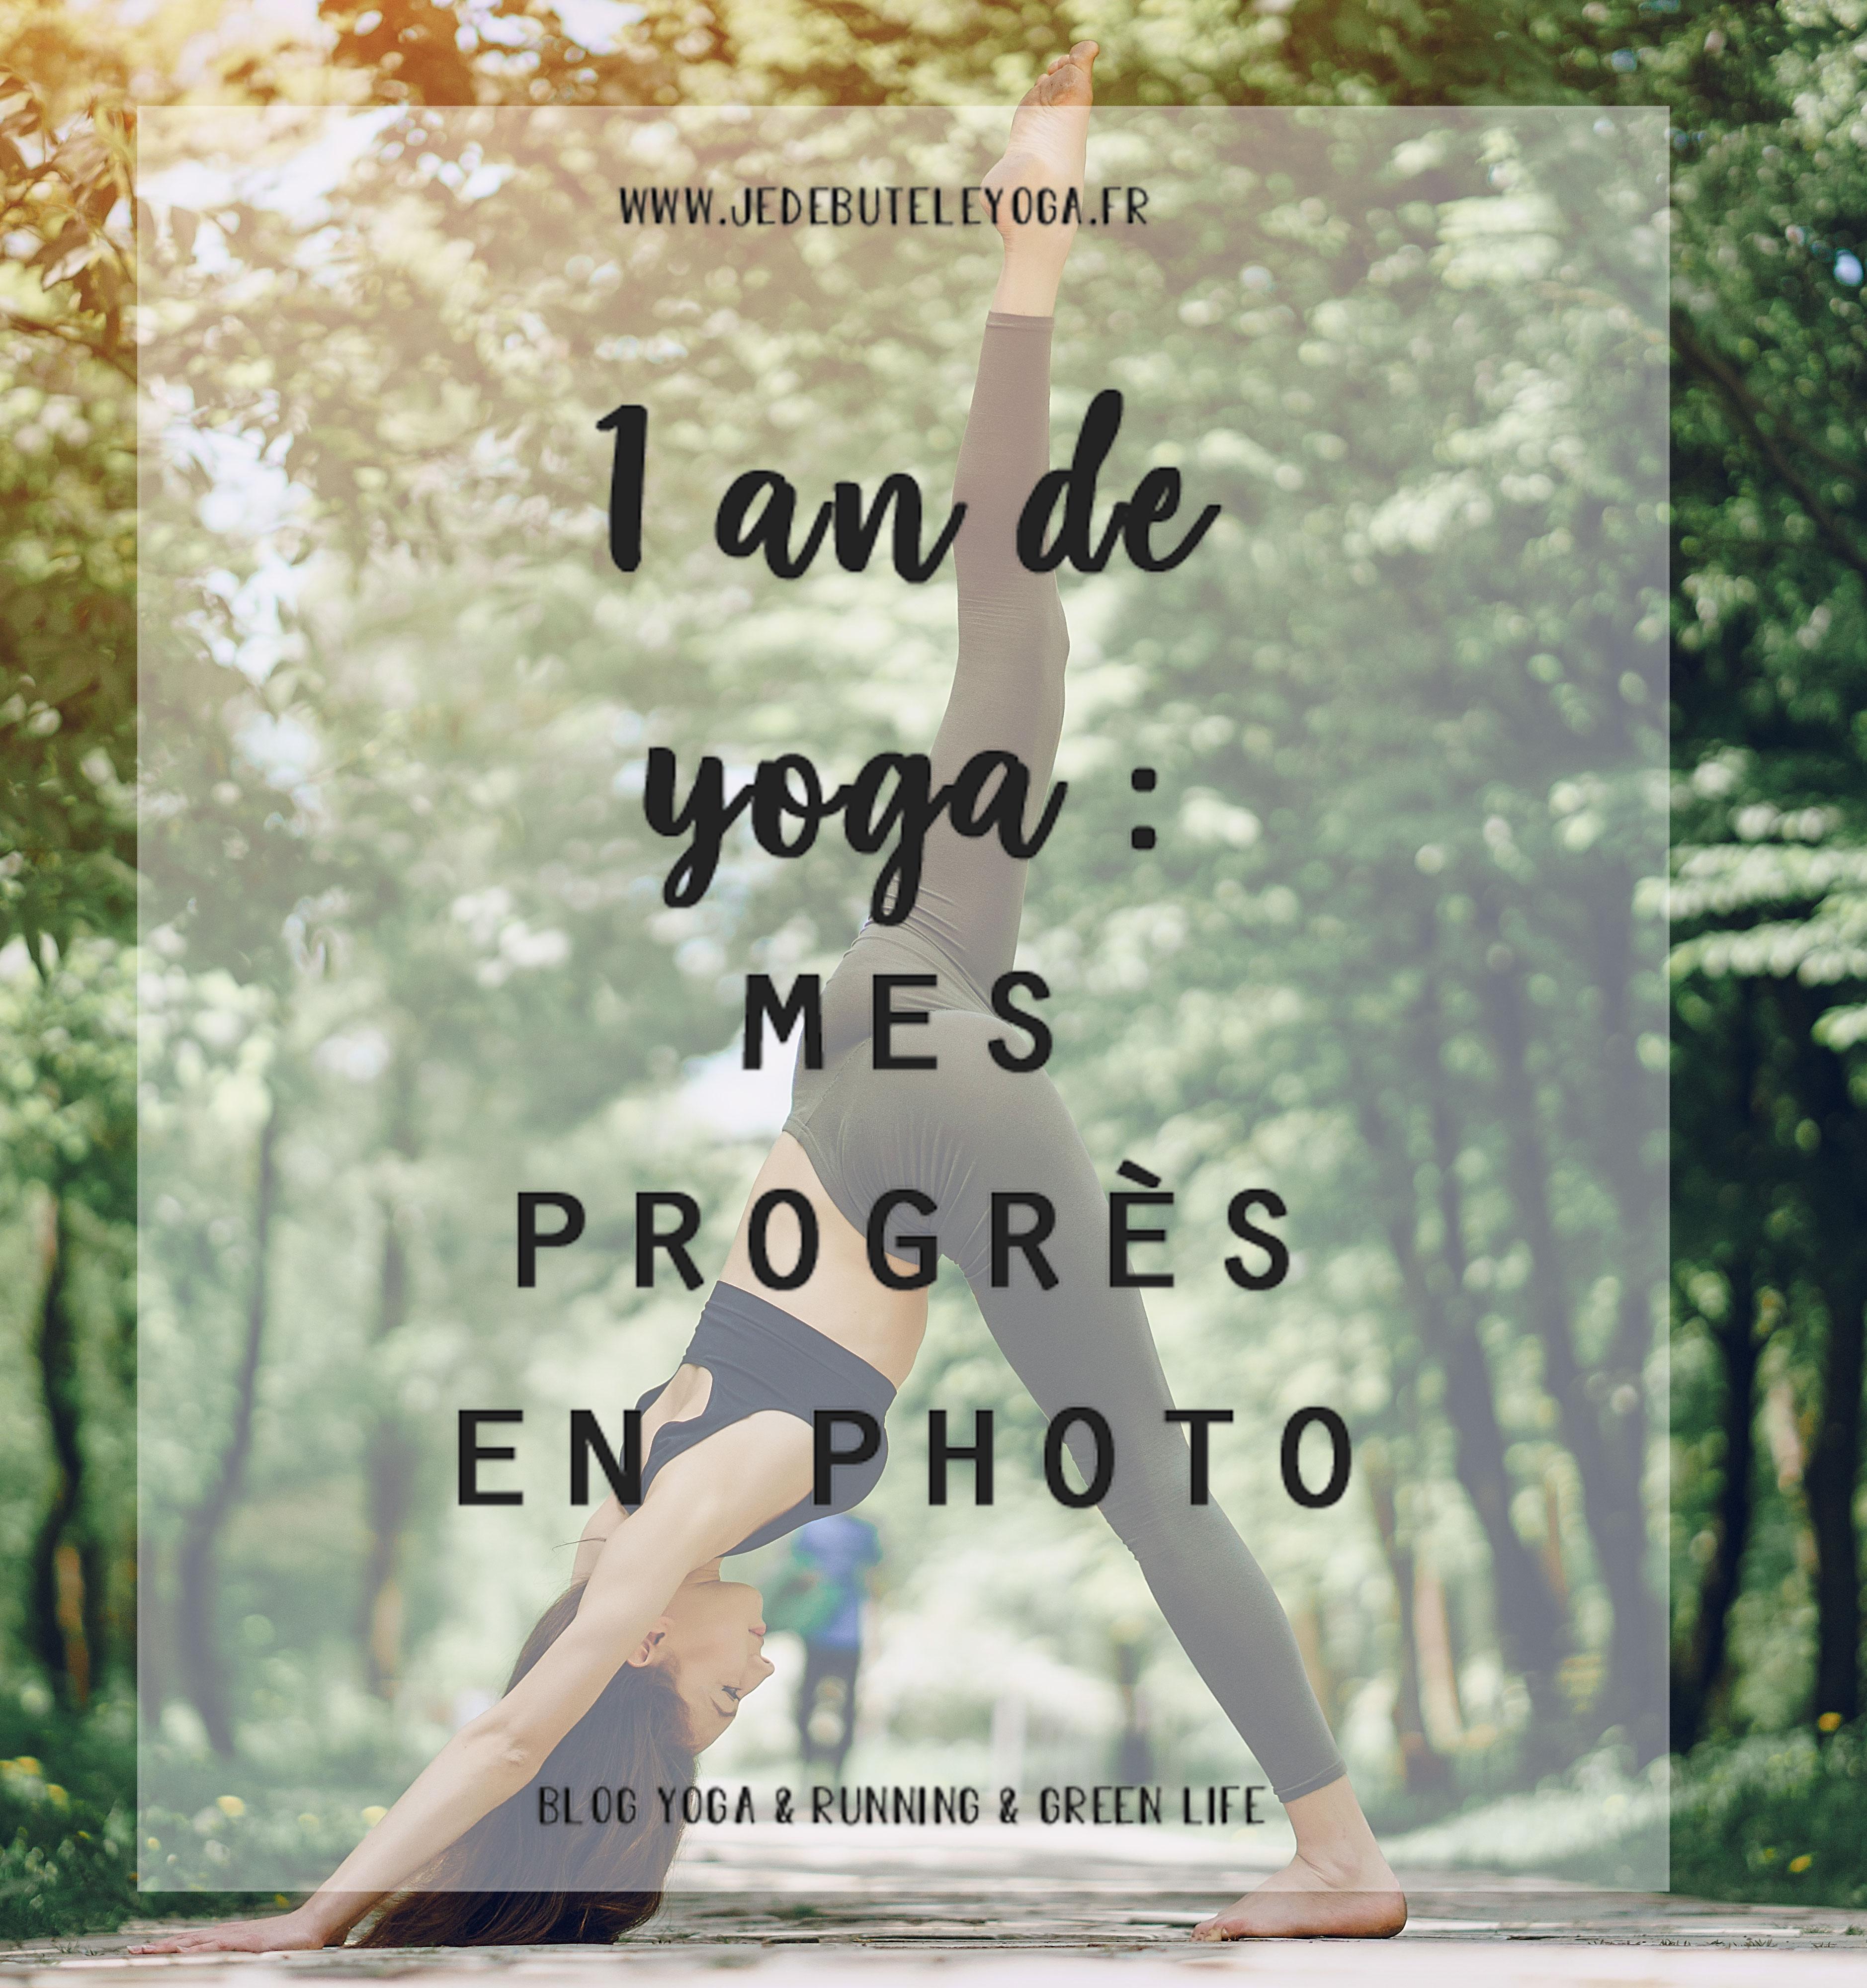 1 an de yoga : mes progrès en photo